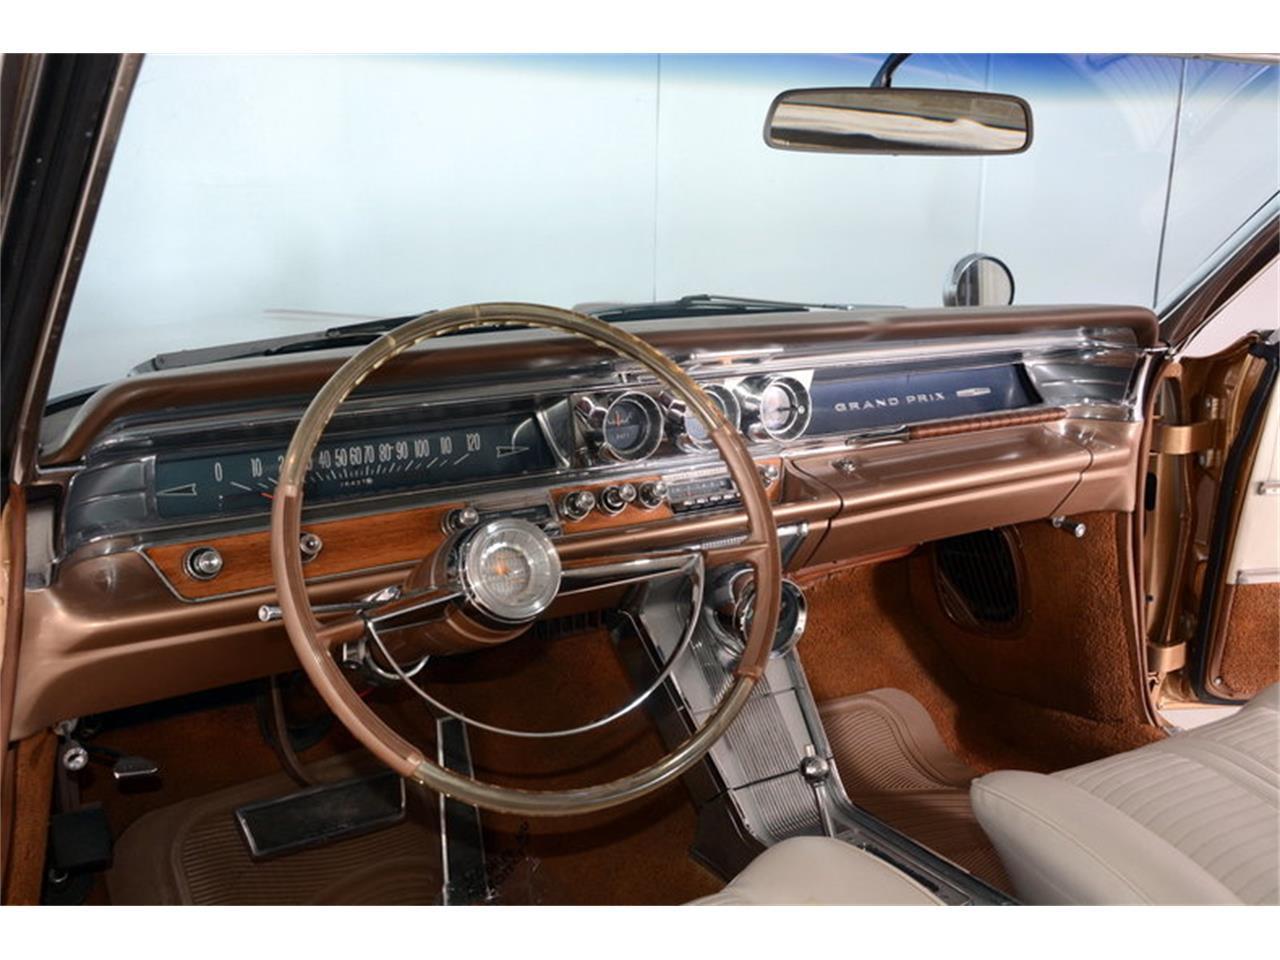 Large Picture of 1963 Pontiac Grand Prix - $24,998.00 - L30D